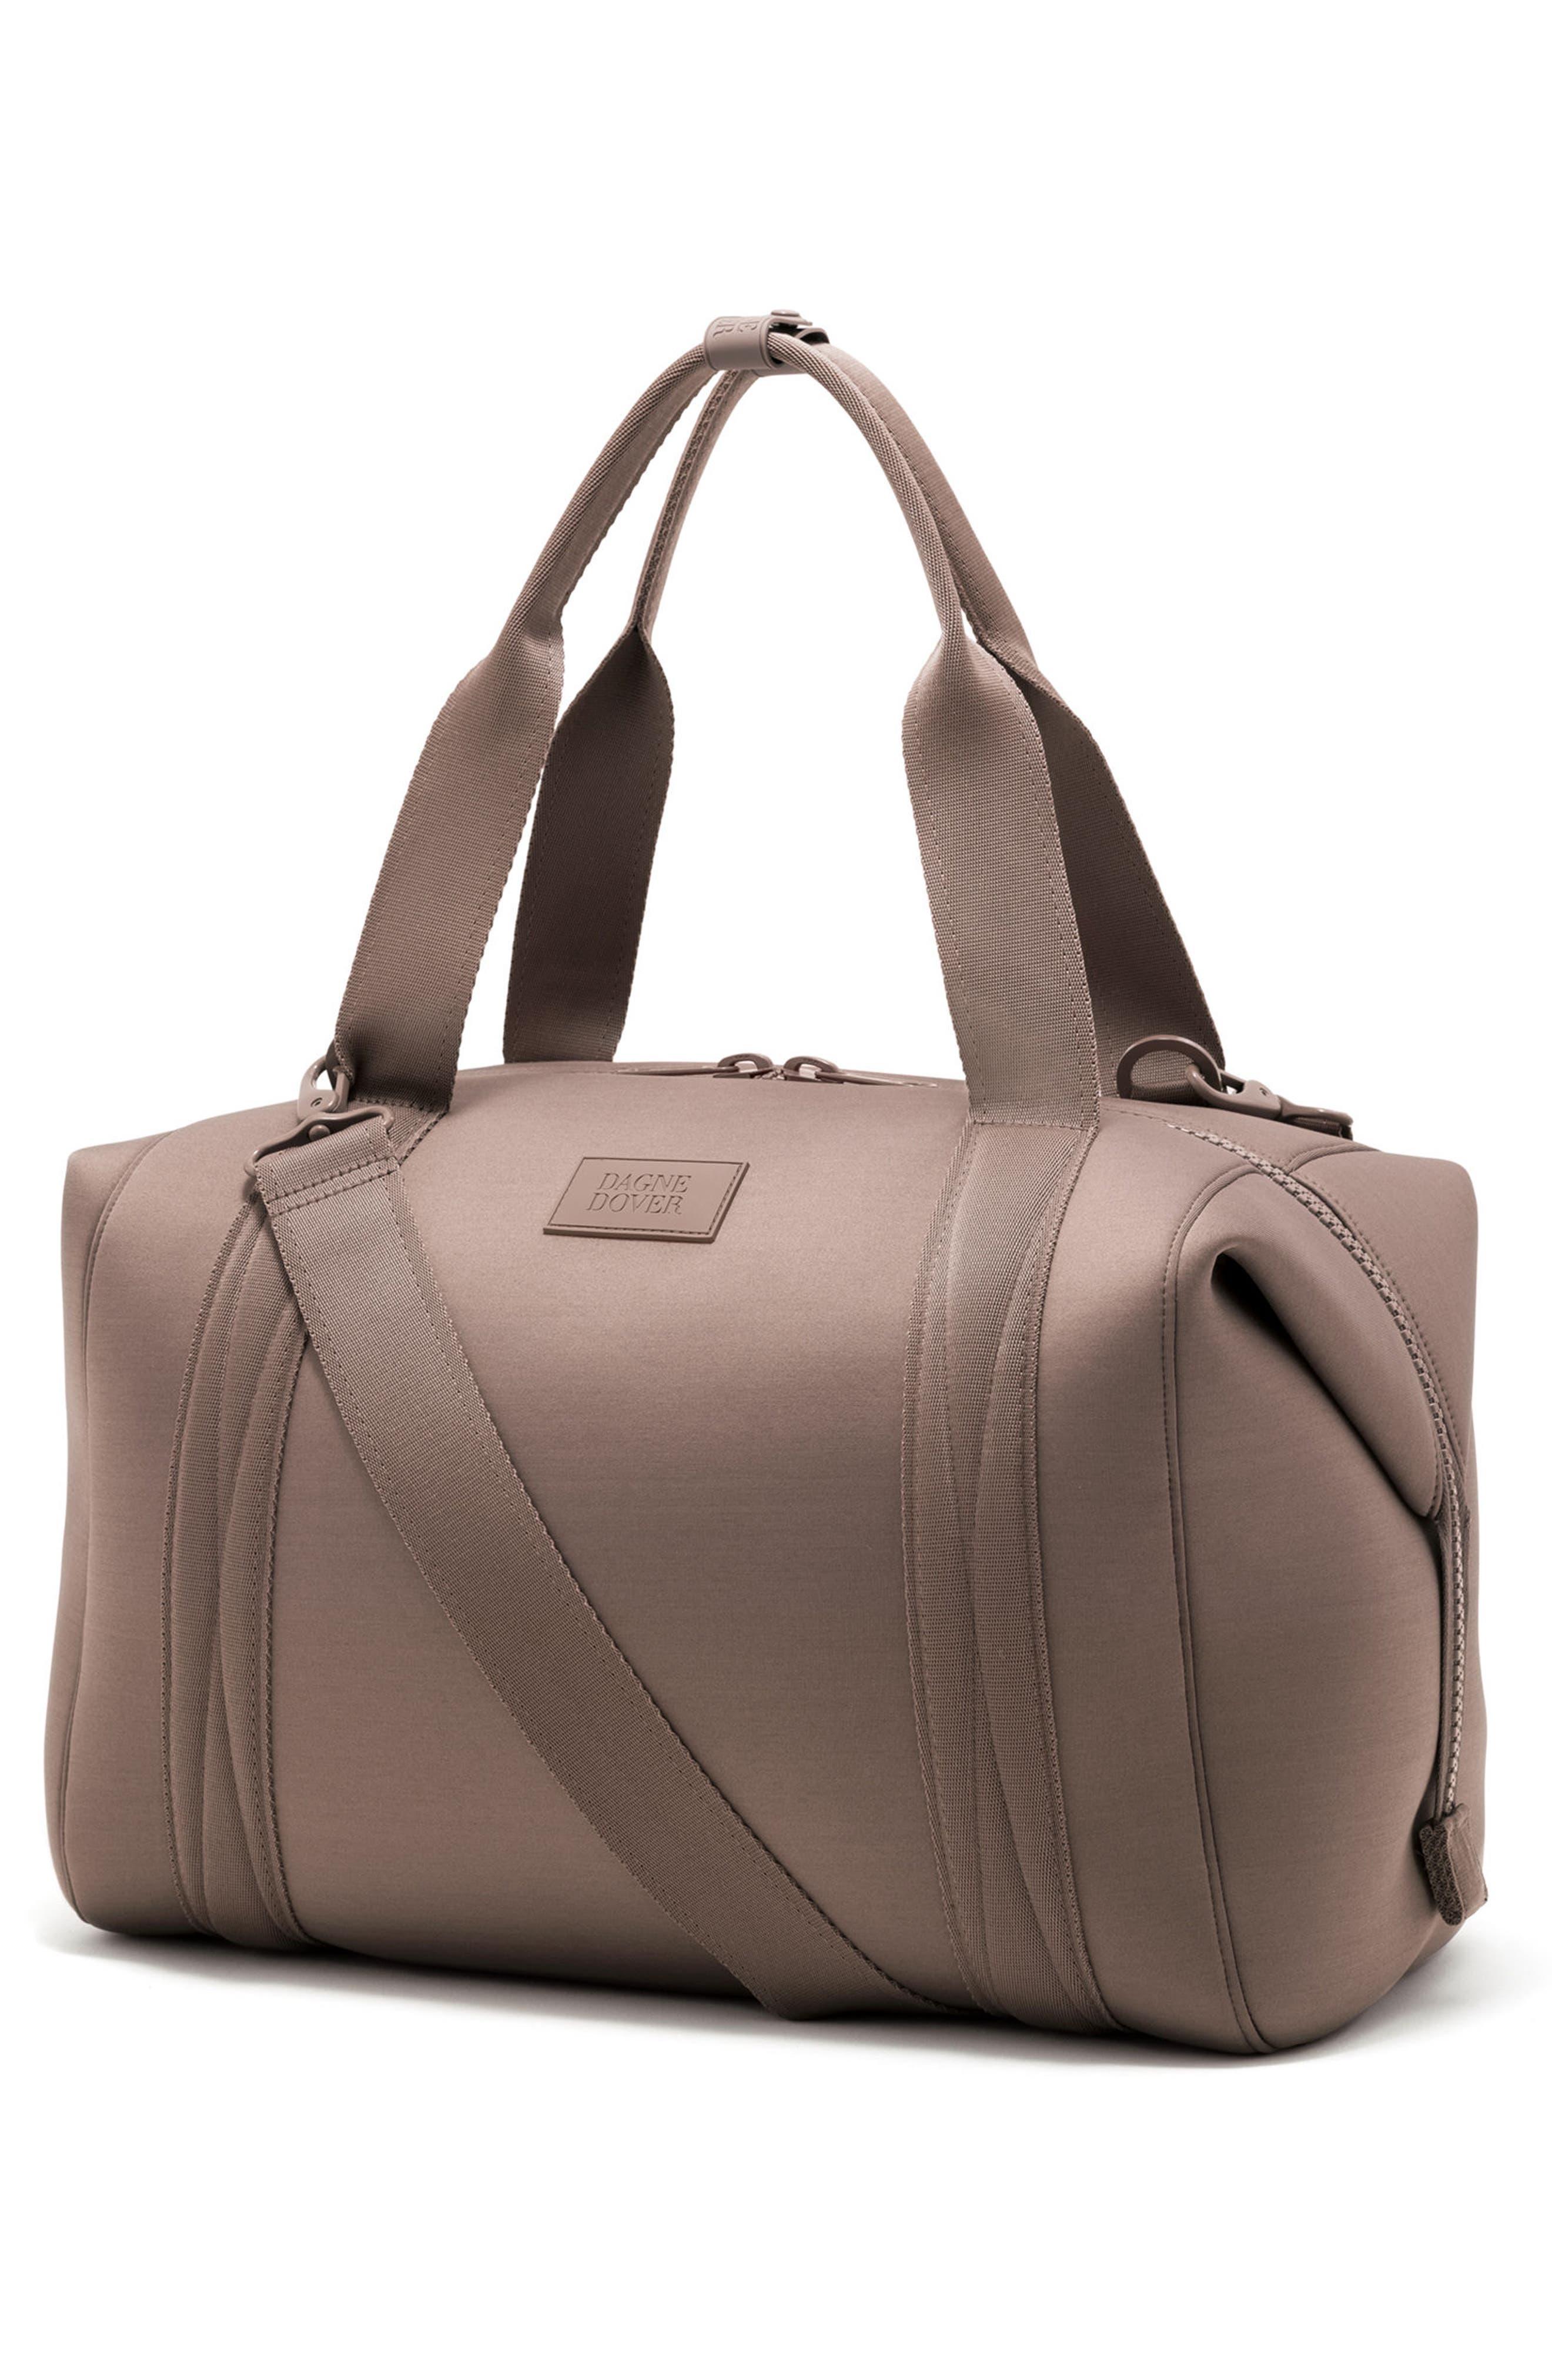 365 Large Landon Neoprene Carryall Duffel Bag,                             Alternate thumbnail 21, color,